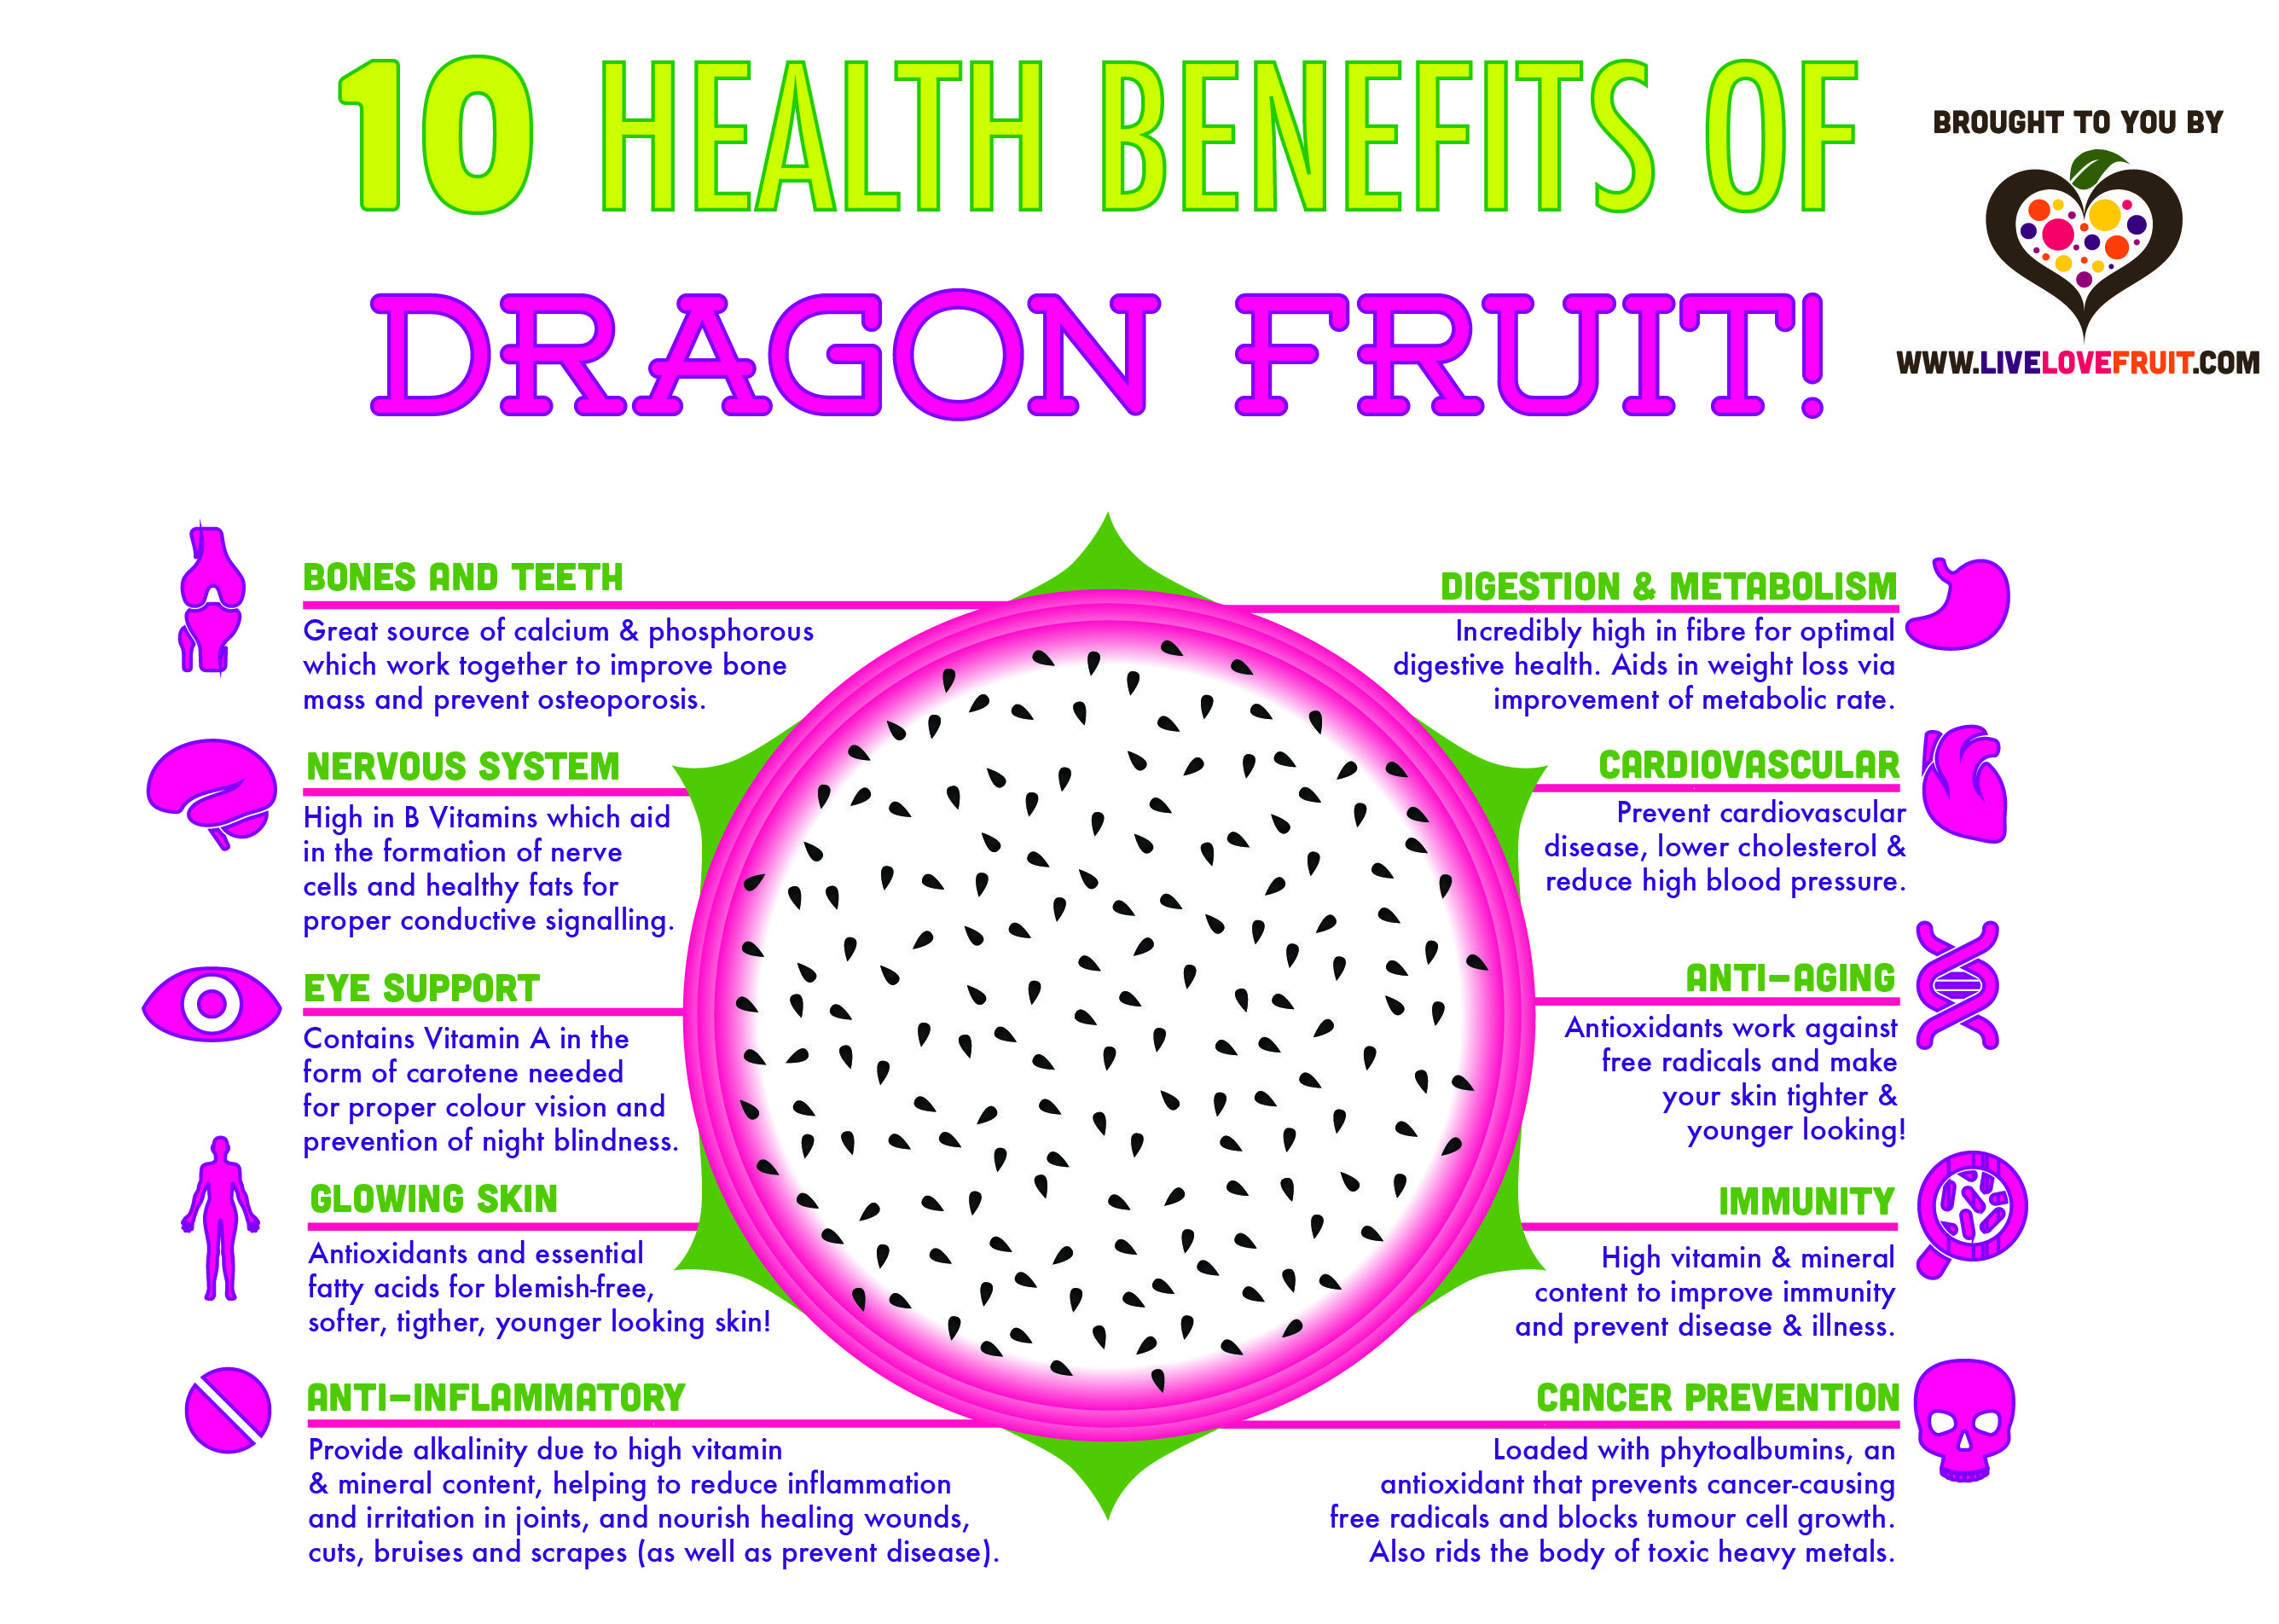 10 Amazing Health Benefits Of Dragon Fruit  Live Love Fruit